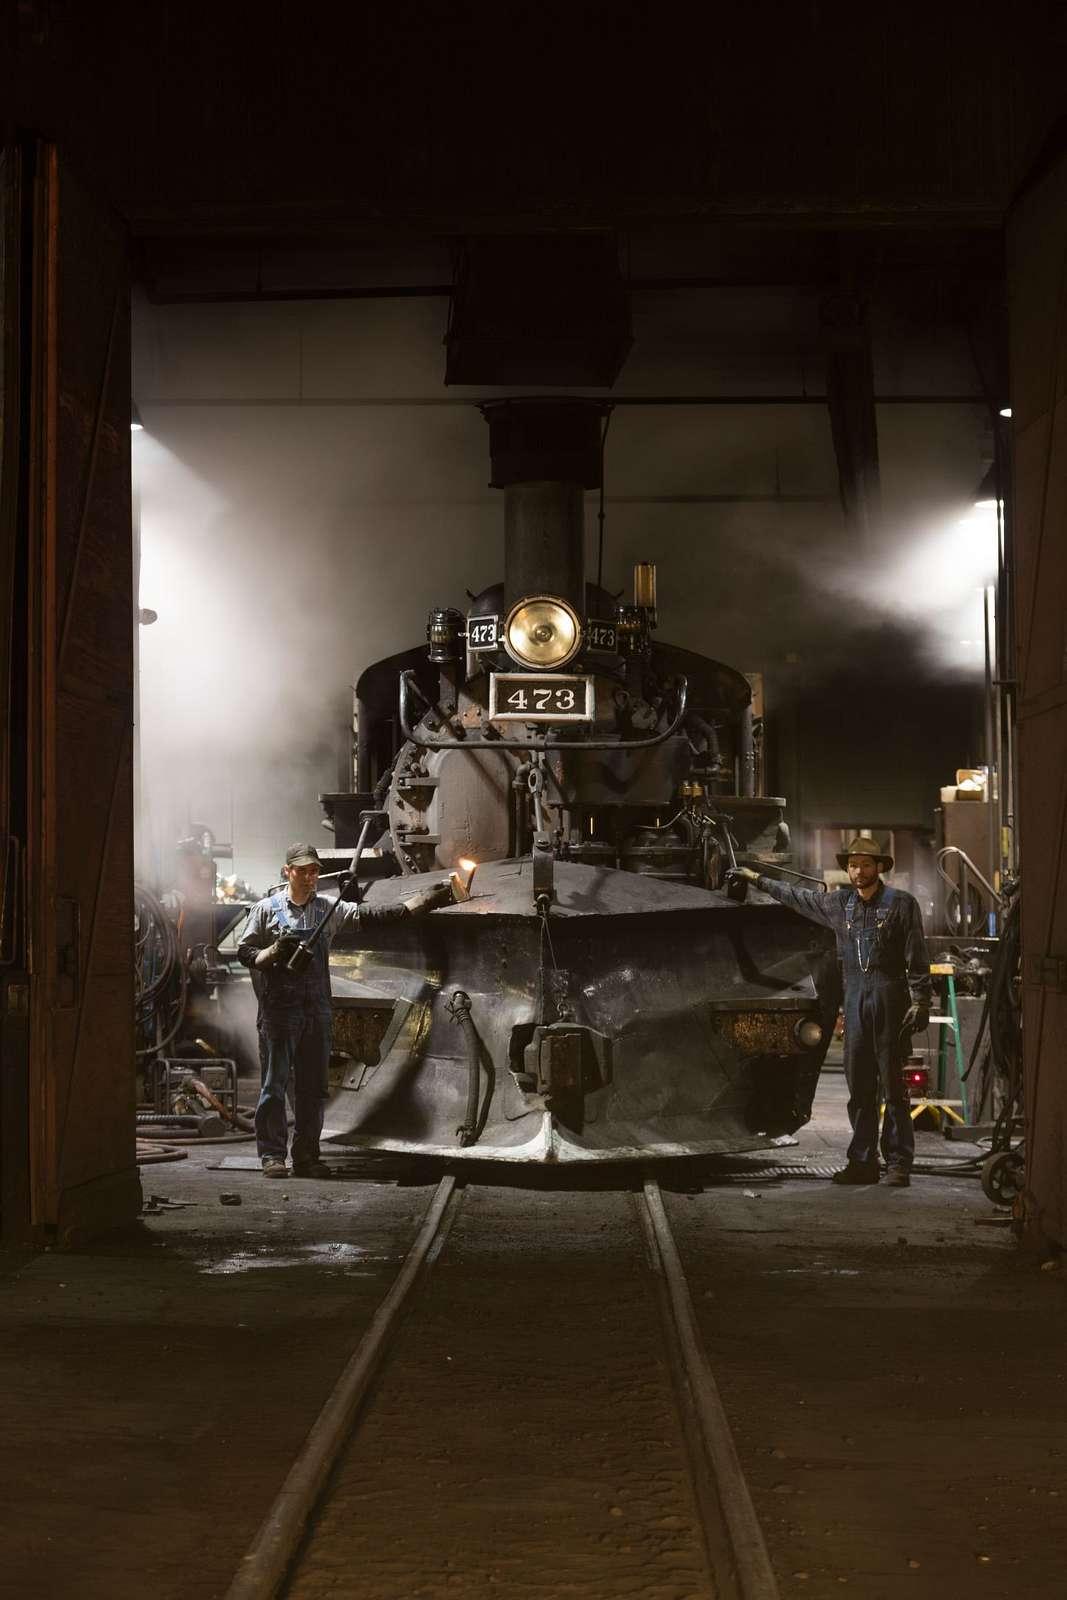 Steam locomotives in the roundhouse of the Durango & Silverton Narrow Gauge Scenic Railroad in Durango, Colorado